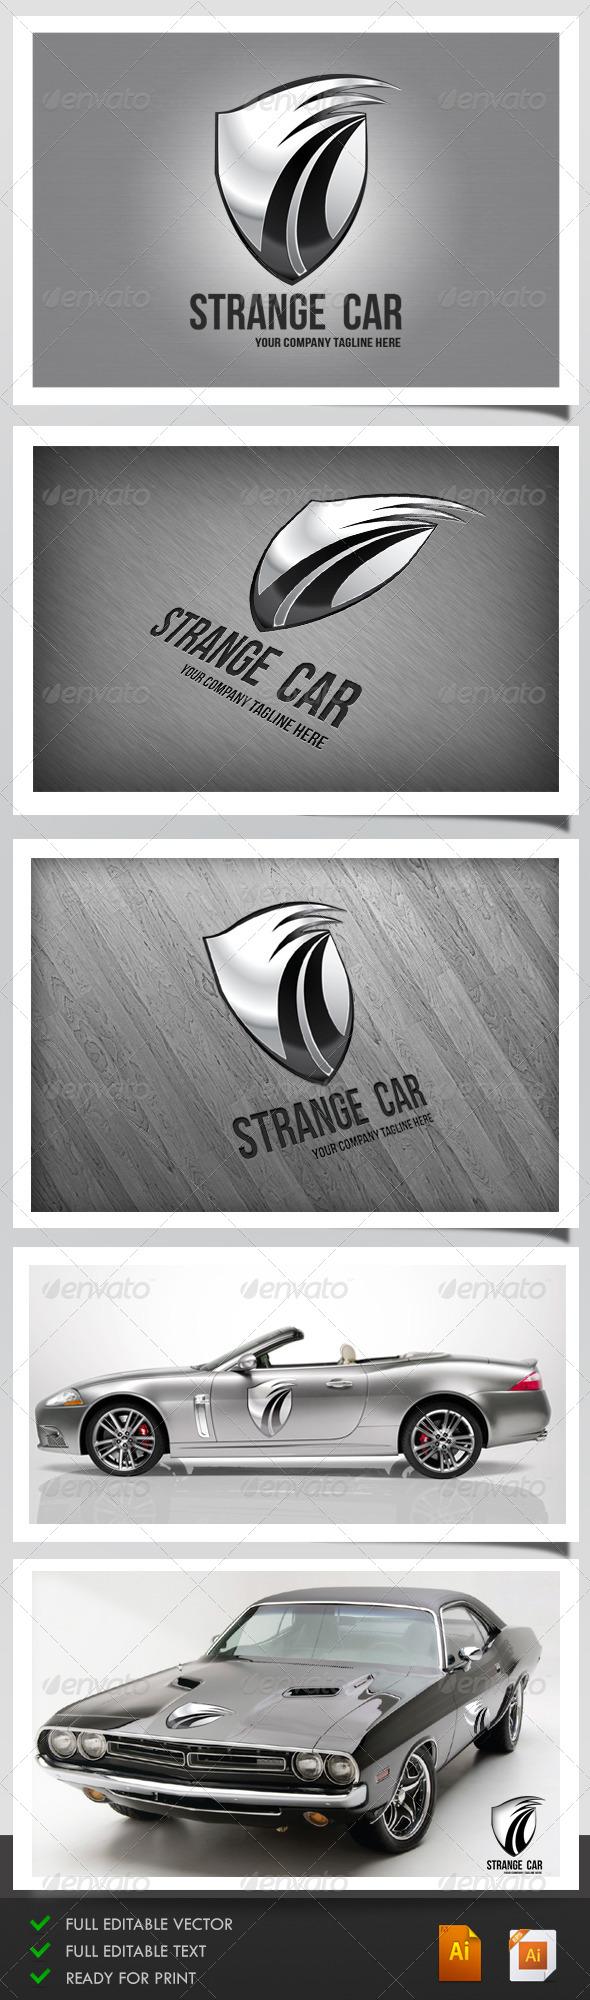 Car Logo Graphics Designs Templates From Graphicriver